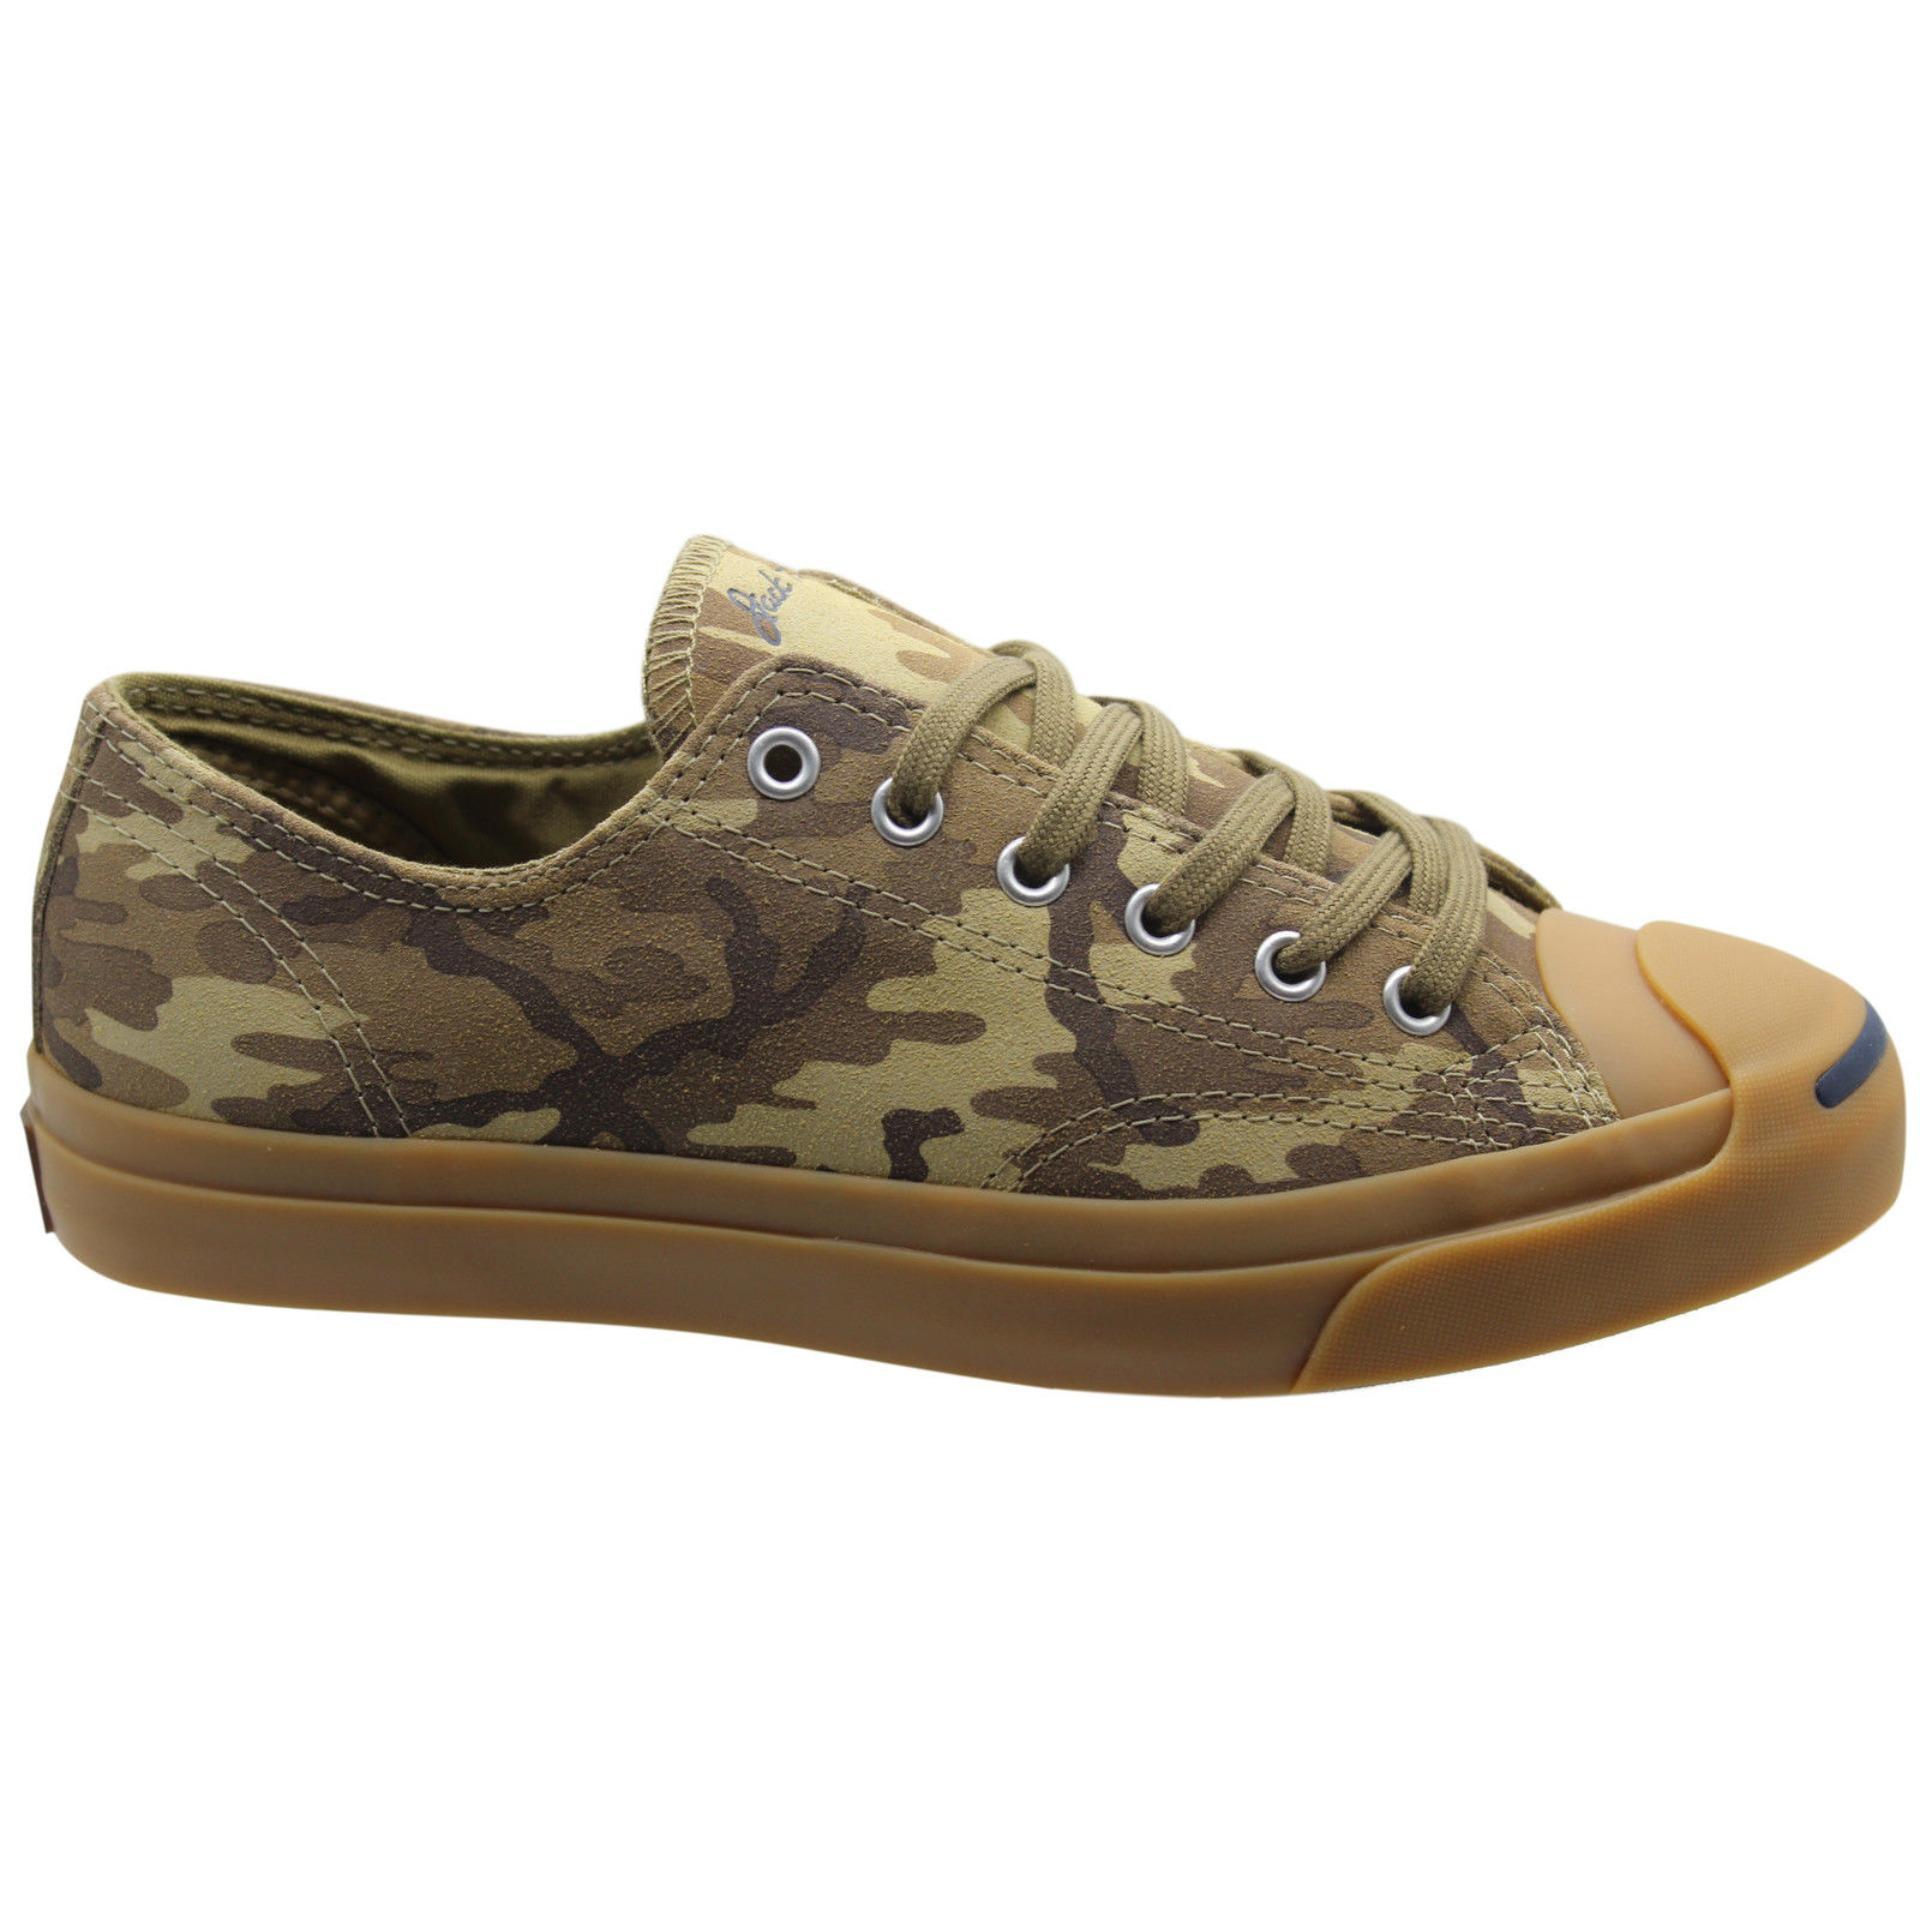 Converse Jack Purcell LTT OX Lead Gray Sepatu Sneakers Pria